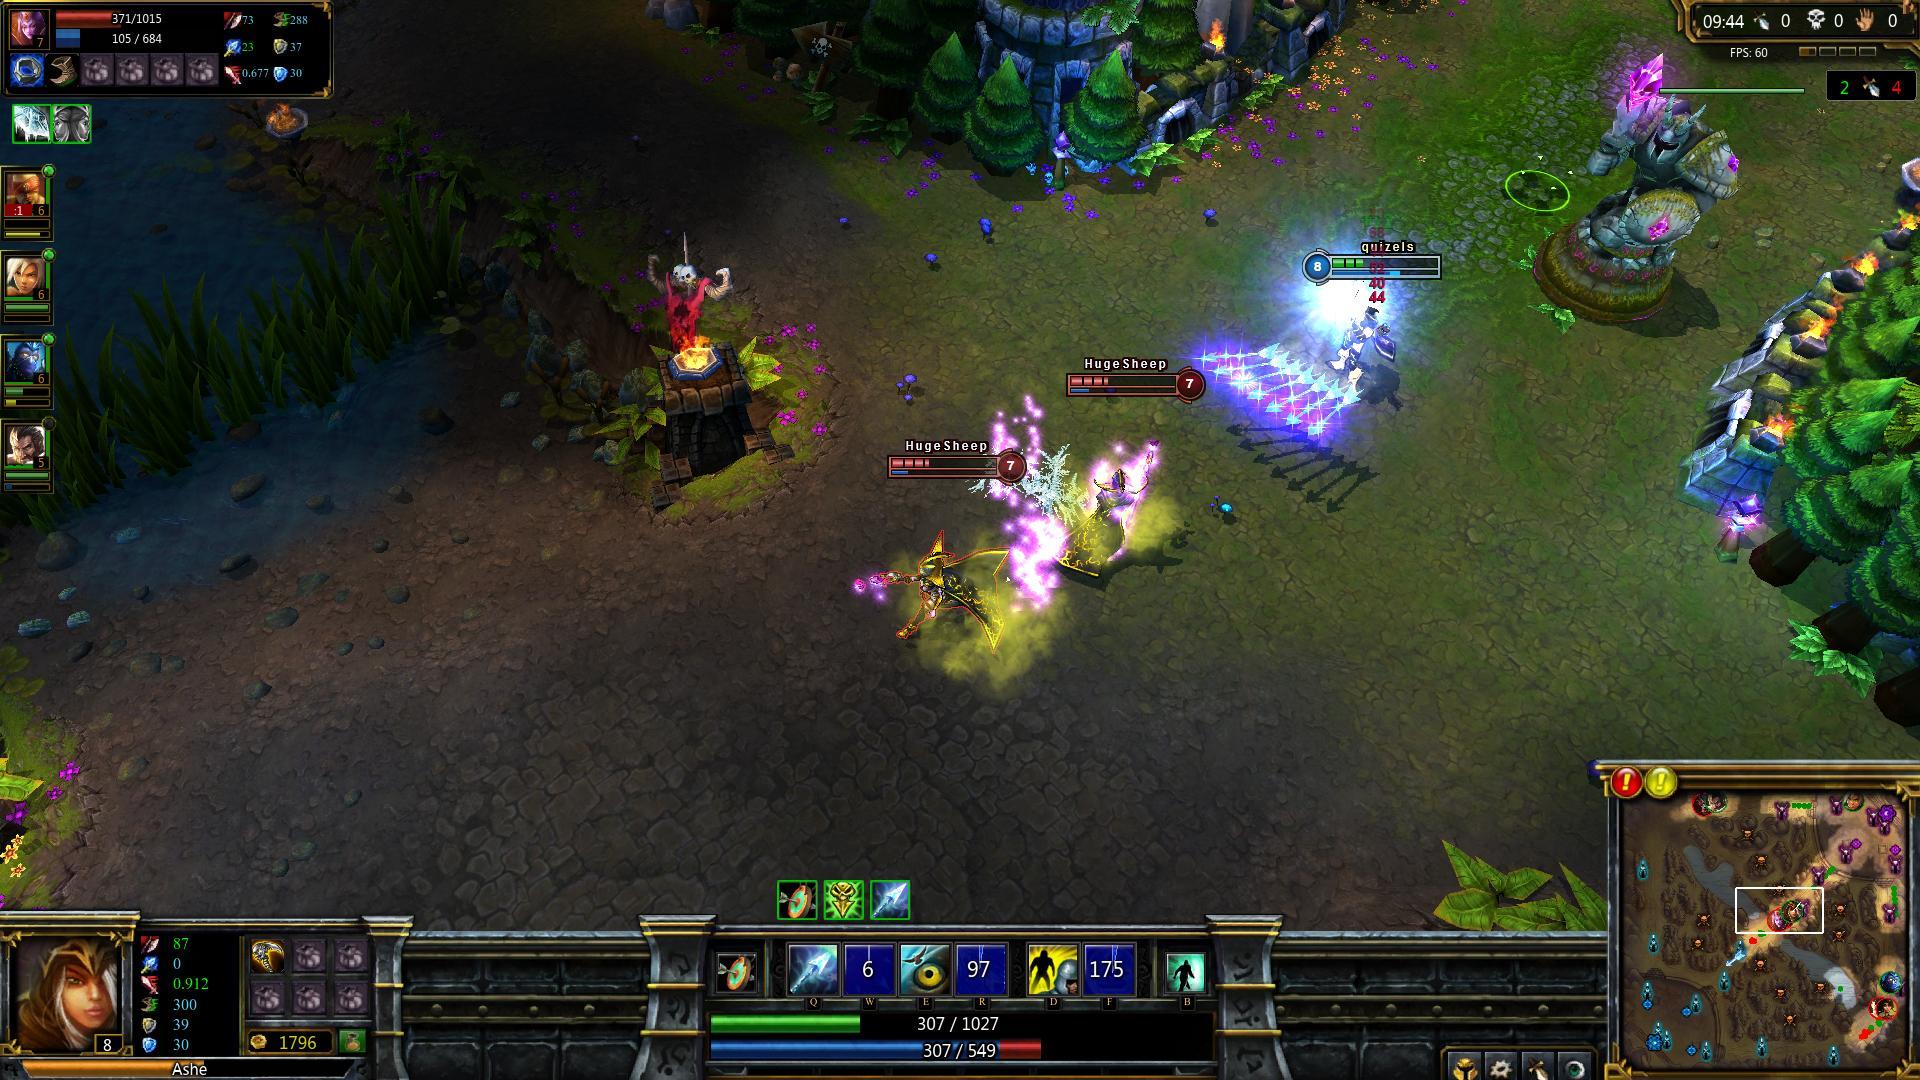 League of Legends Ashe combat lol screenshot - Gamingcfg com